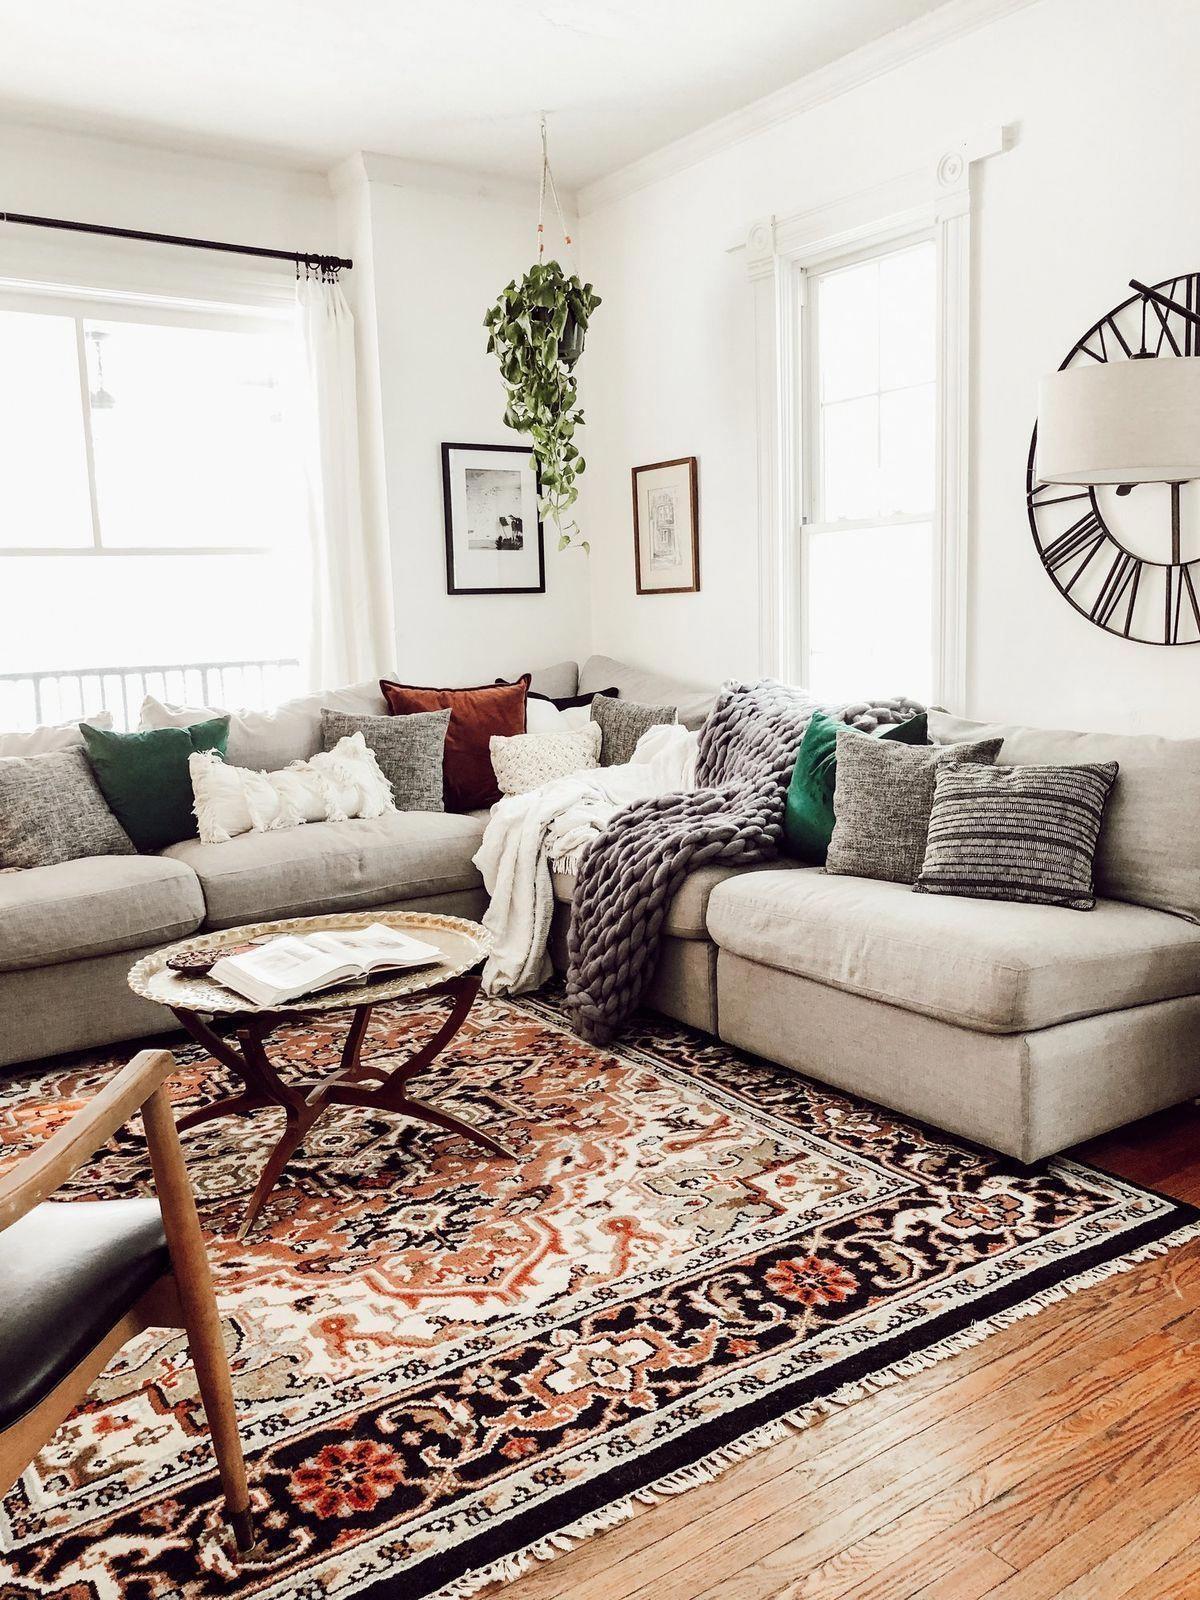 Home Interior Design Game Online: Home Interior Design Games Free #Homeinteriordesign